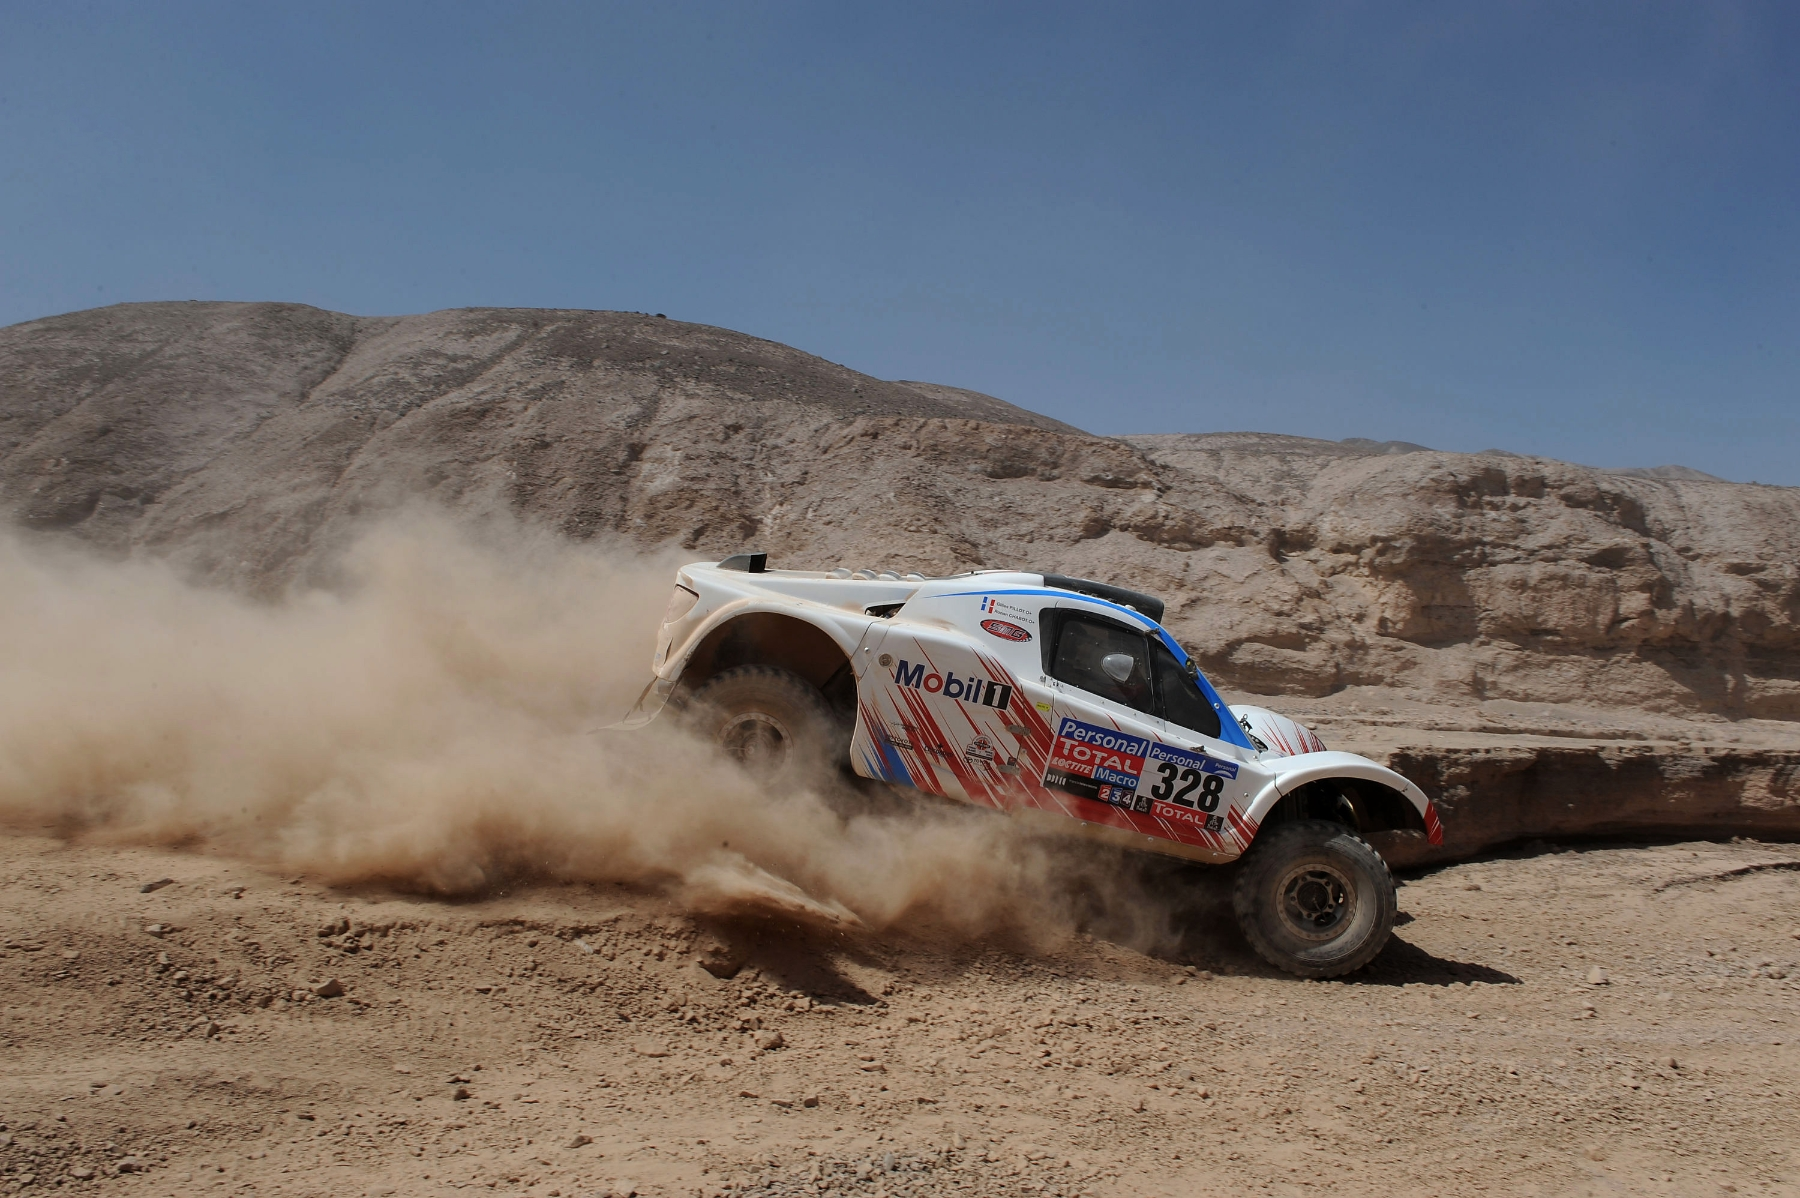 AUTO - DAKAR 2011 RACE PART 1